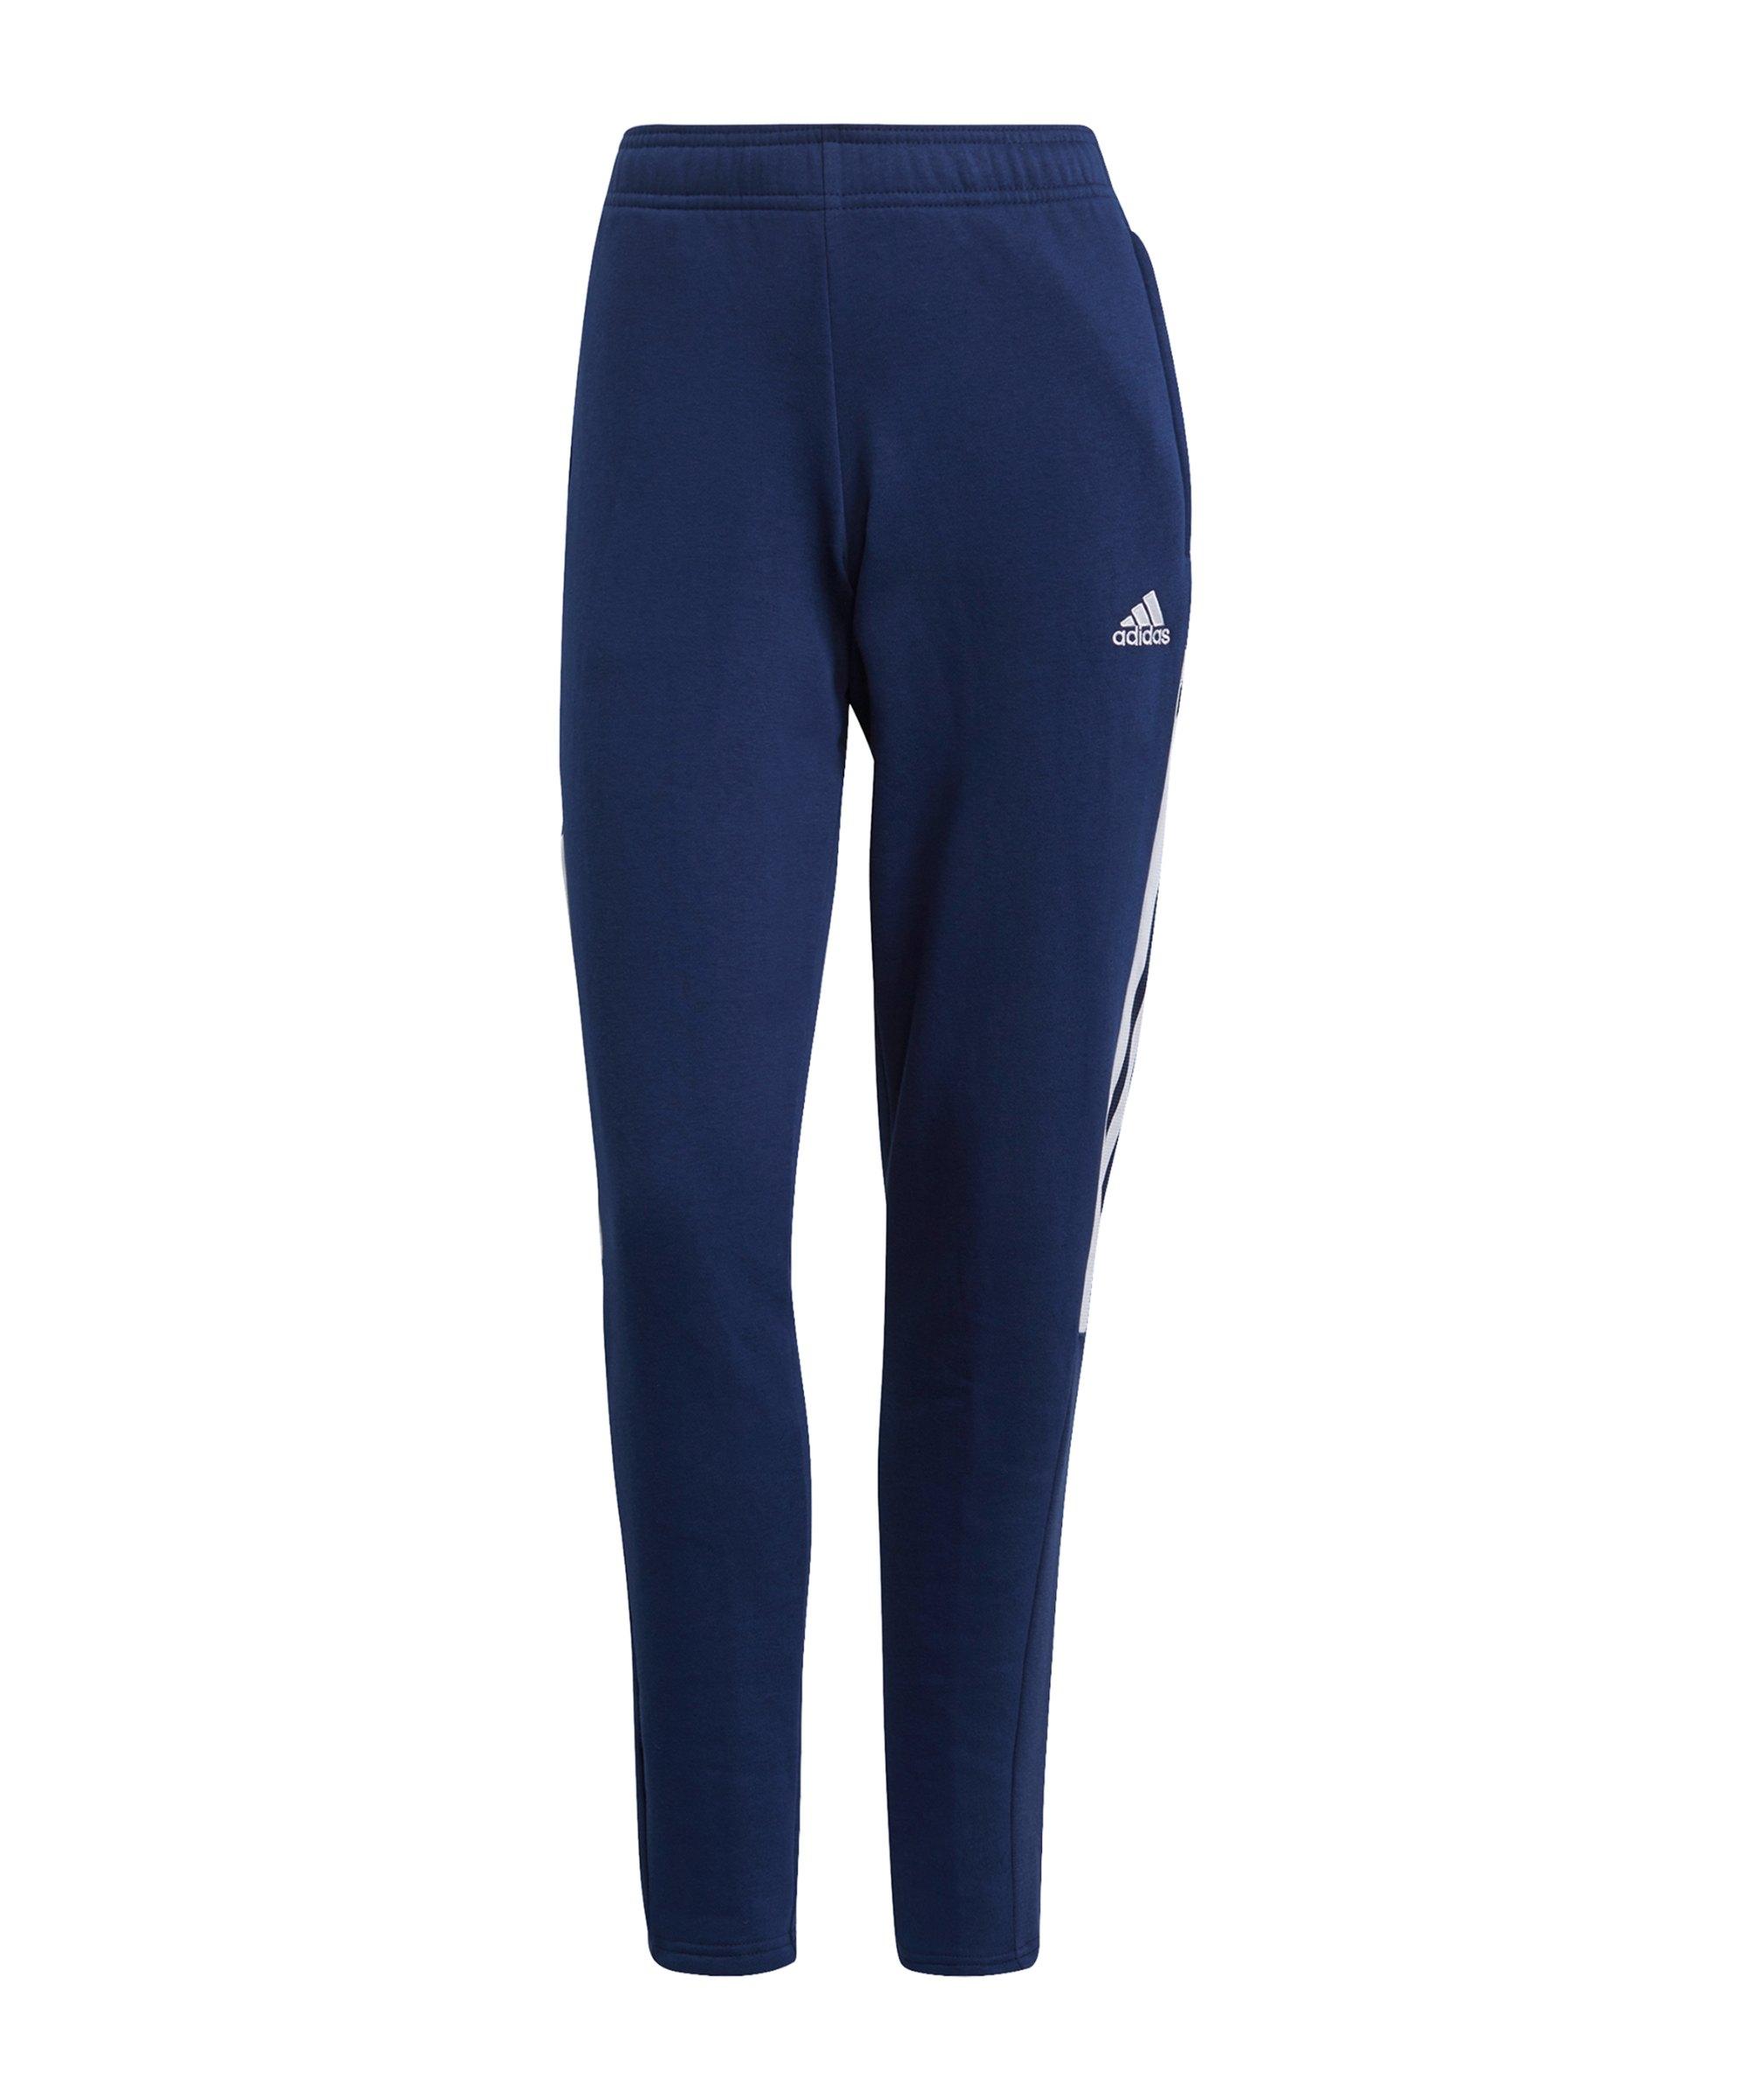 adidas Tiro 21 Jogginghose Damen Dunkelblau - blau